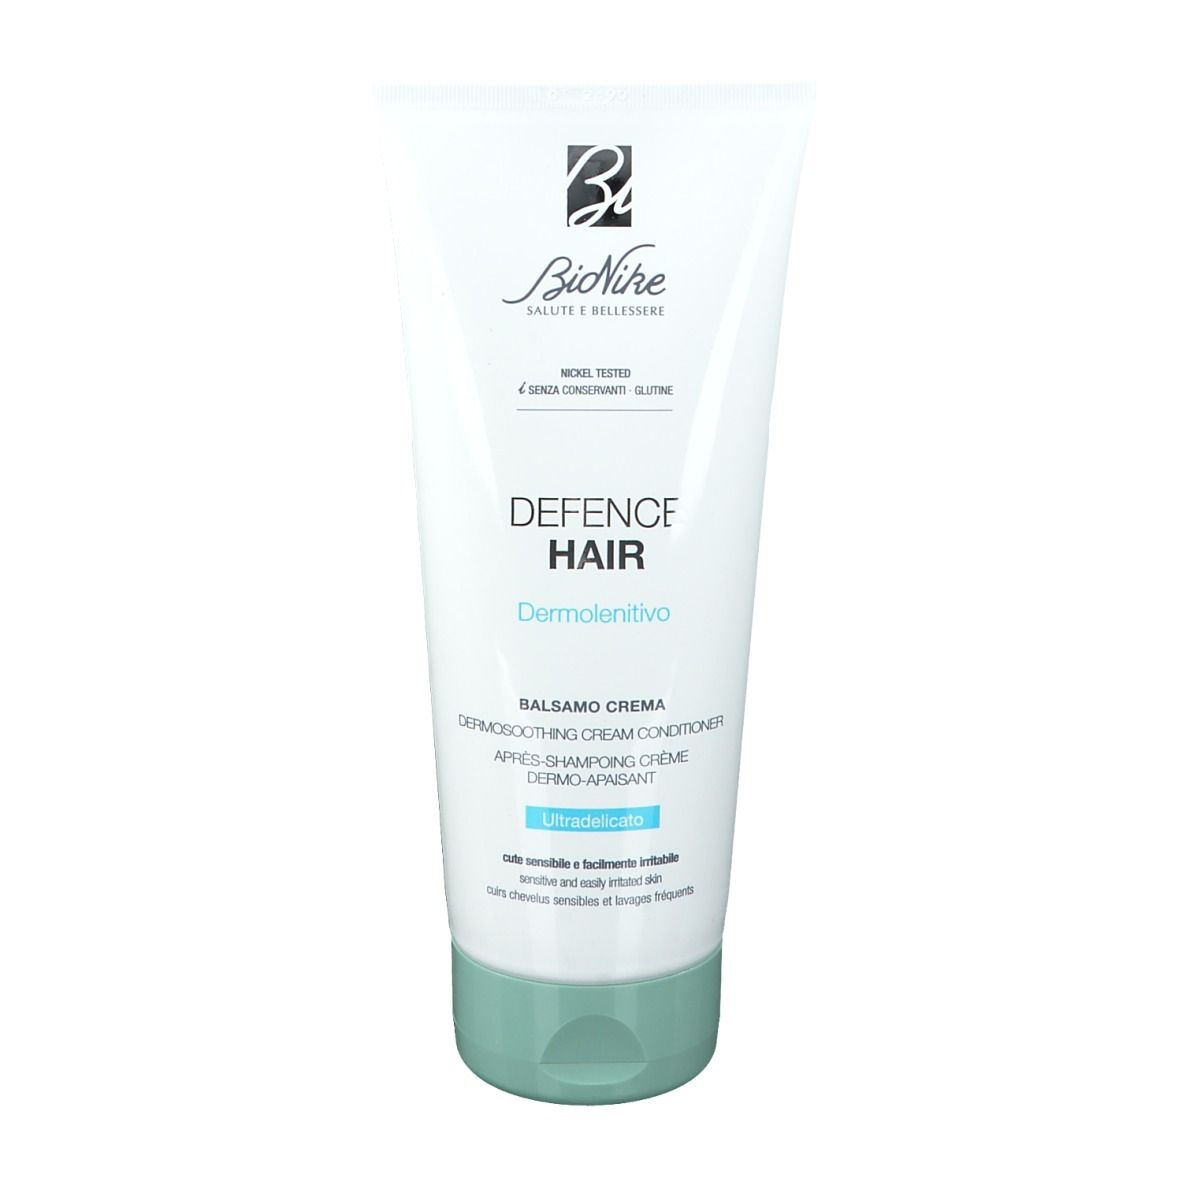 BioNike Defence Hair Après-Shampoing crème Dermo-apaisant ultra-doux